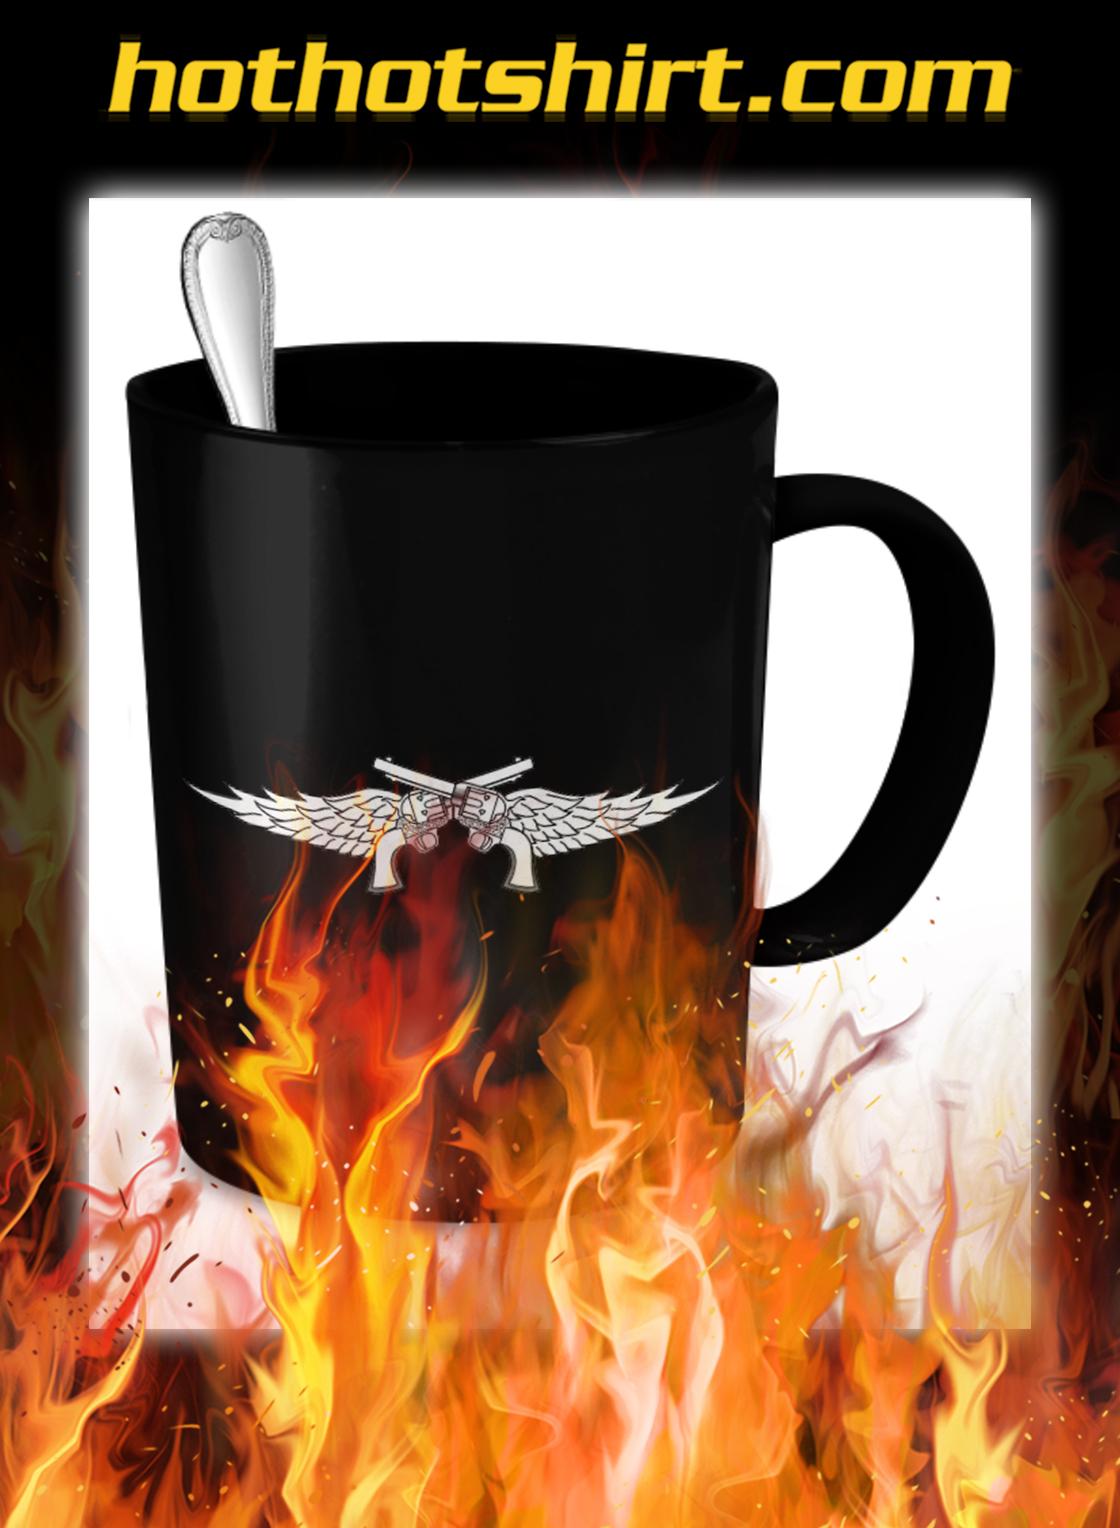 I just got a little gunpowder and kerosene mug- pic 1